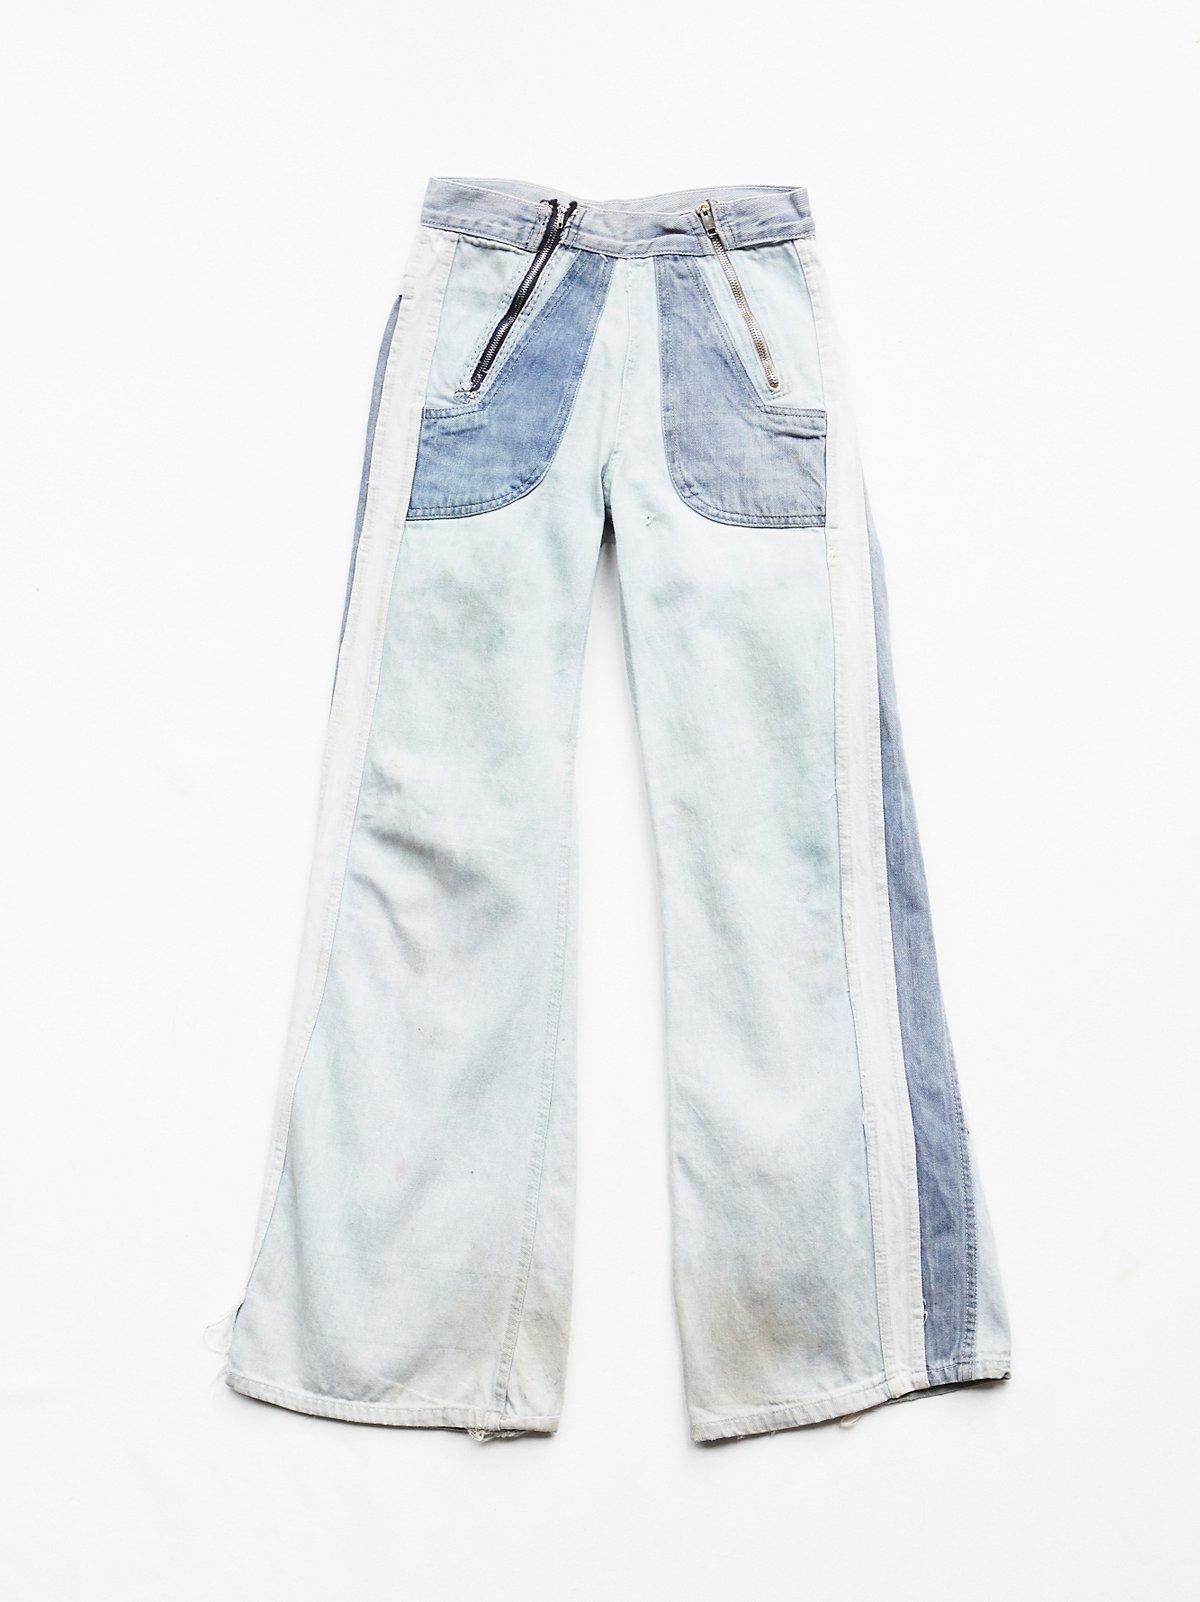 Vintage 70s Paneled Jeans